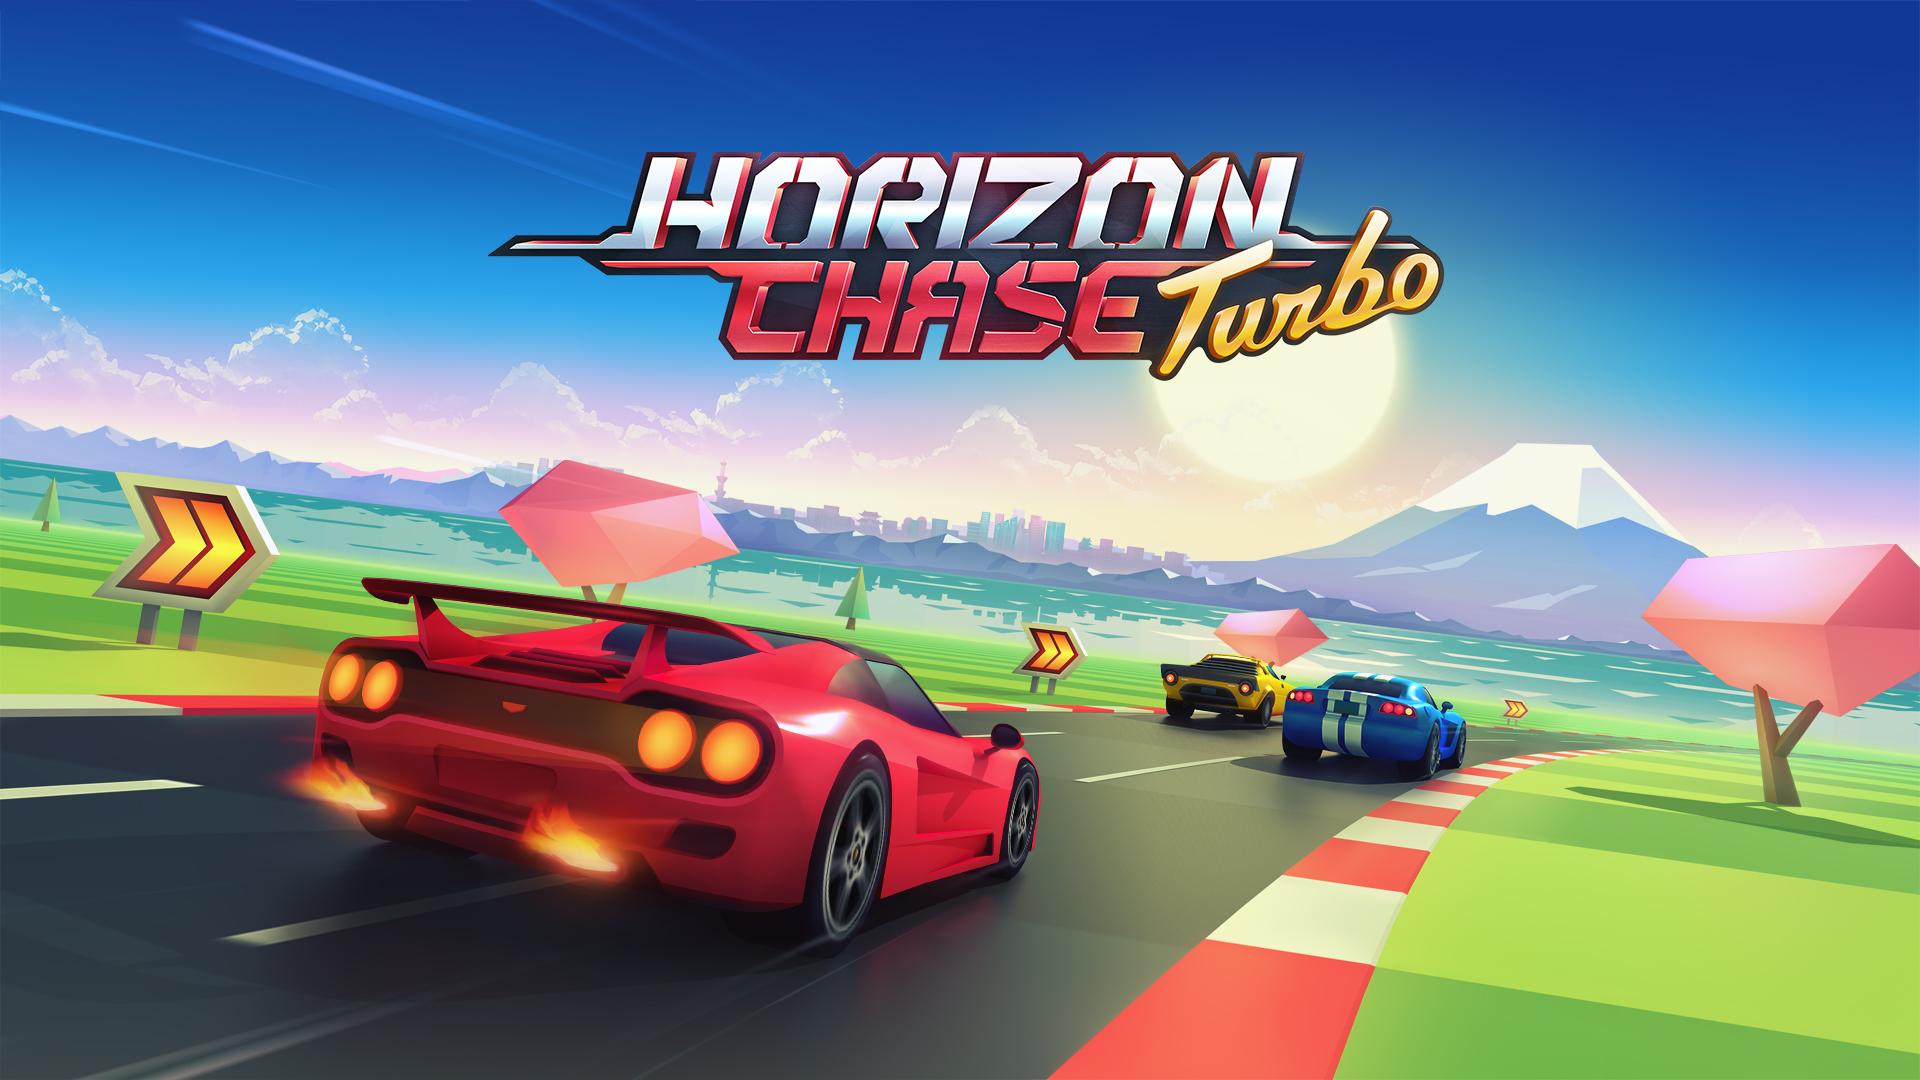 Horizon Chase Turbo (Nintendo Switch Digital Download) $5.99